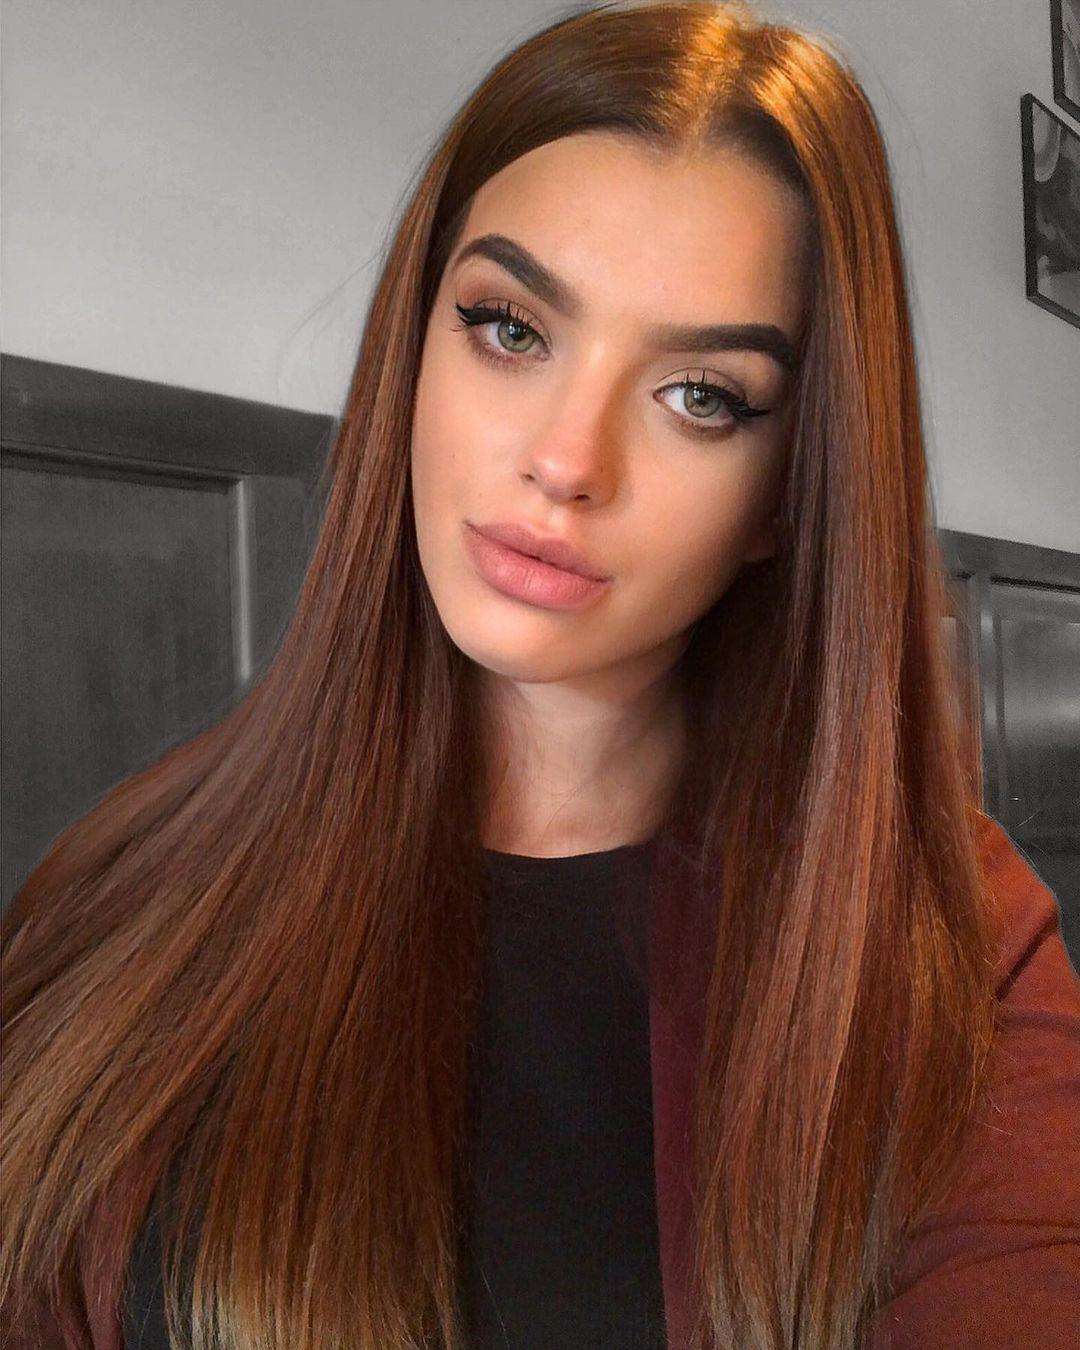 Laurencikova-Laura-Wallpapers-Insta-Fit-Bio-Laura-Laurencikova-Wallpapers-Insta-Fit-Bio-3